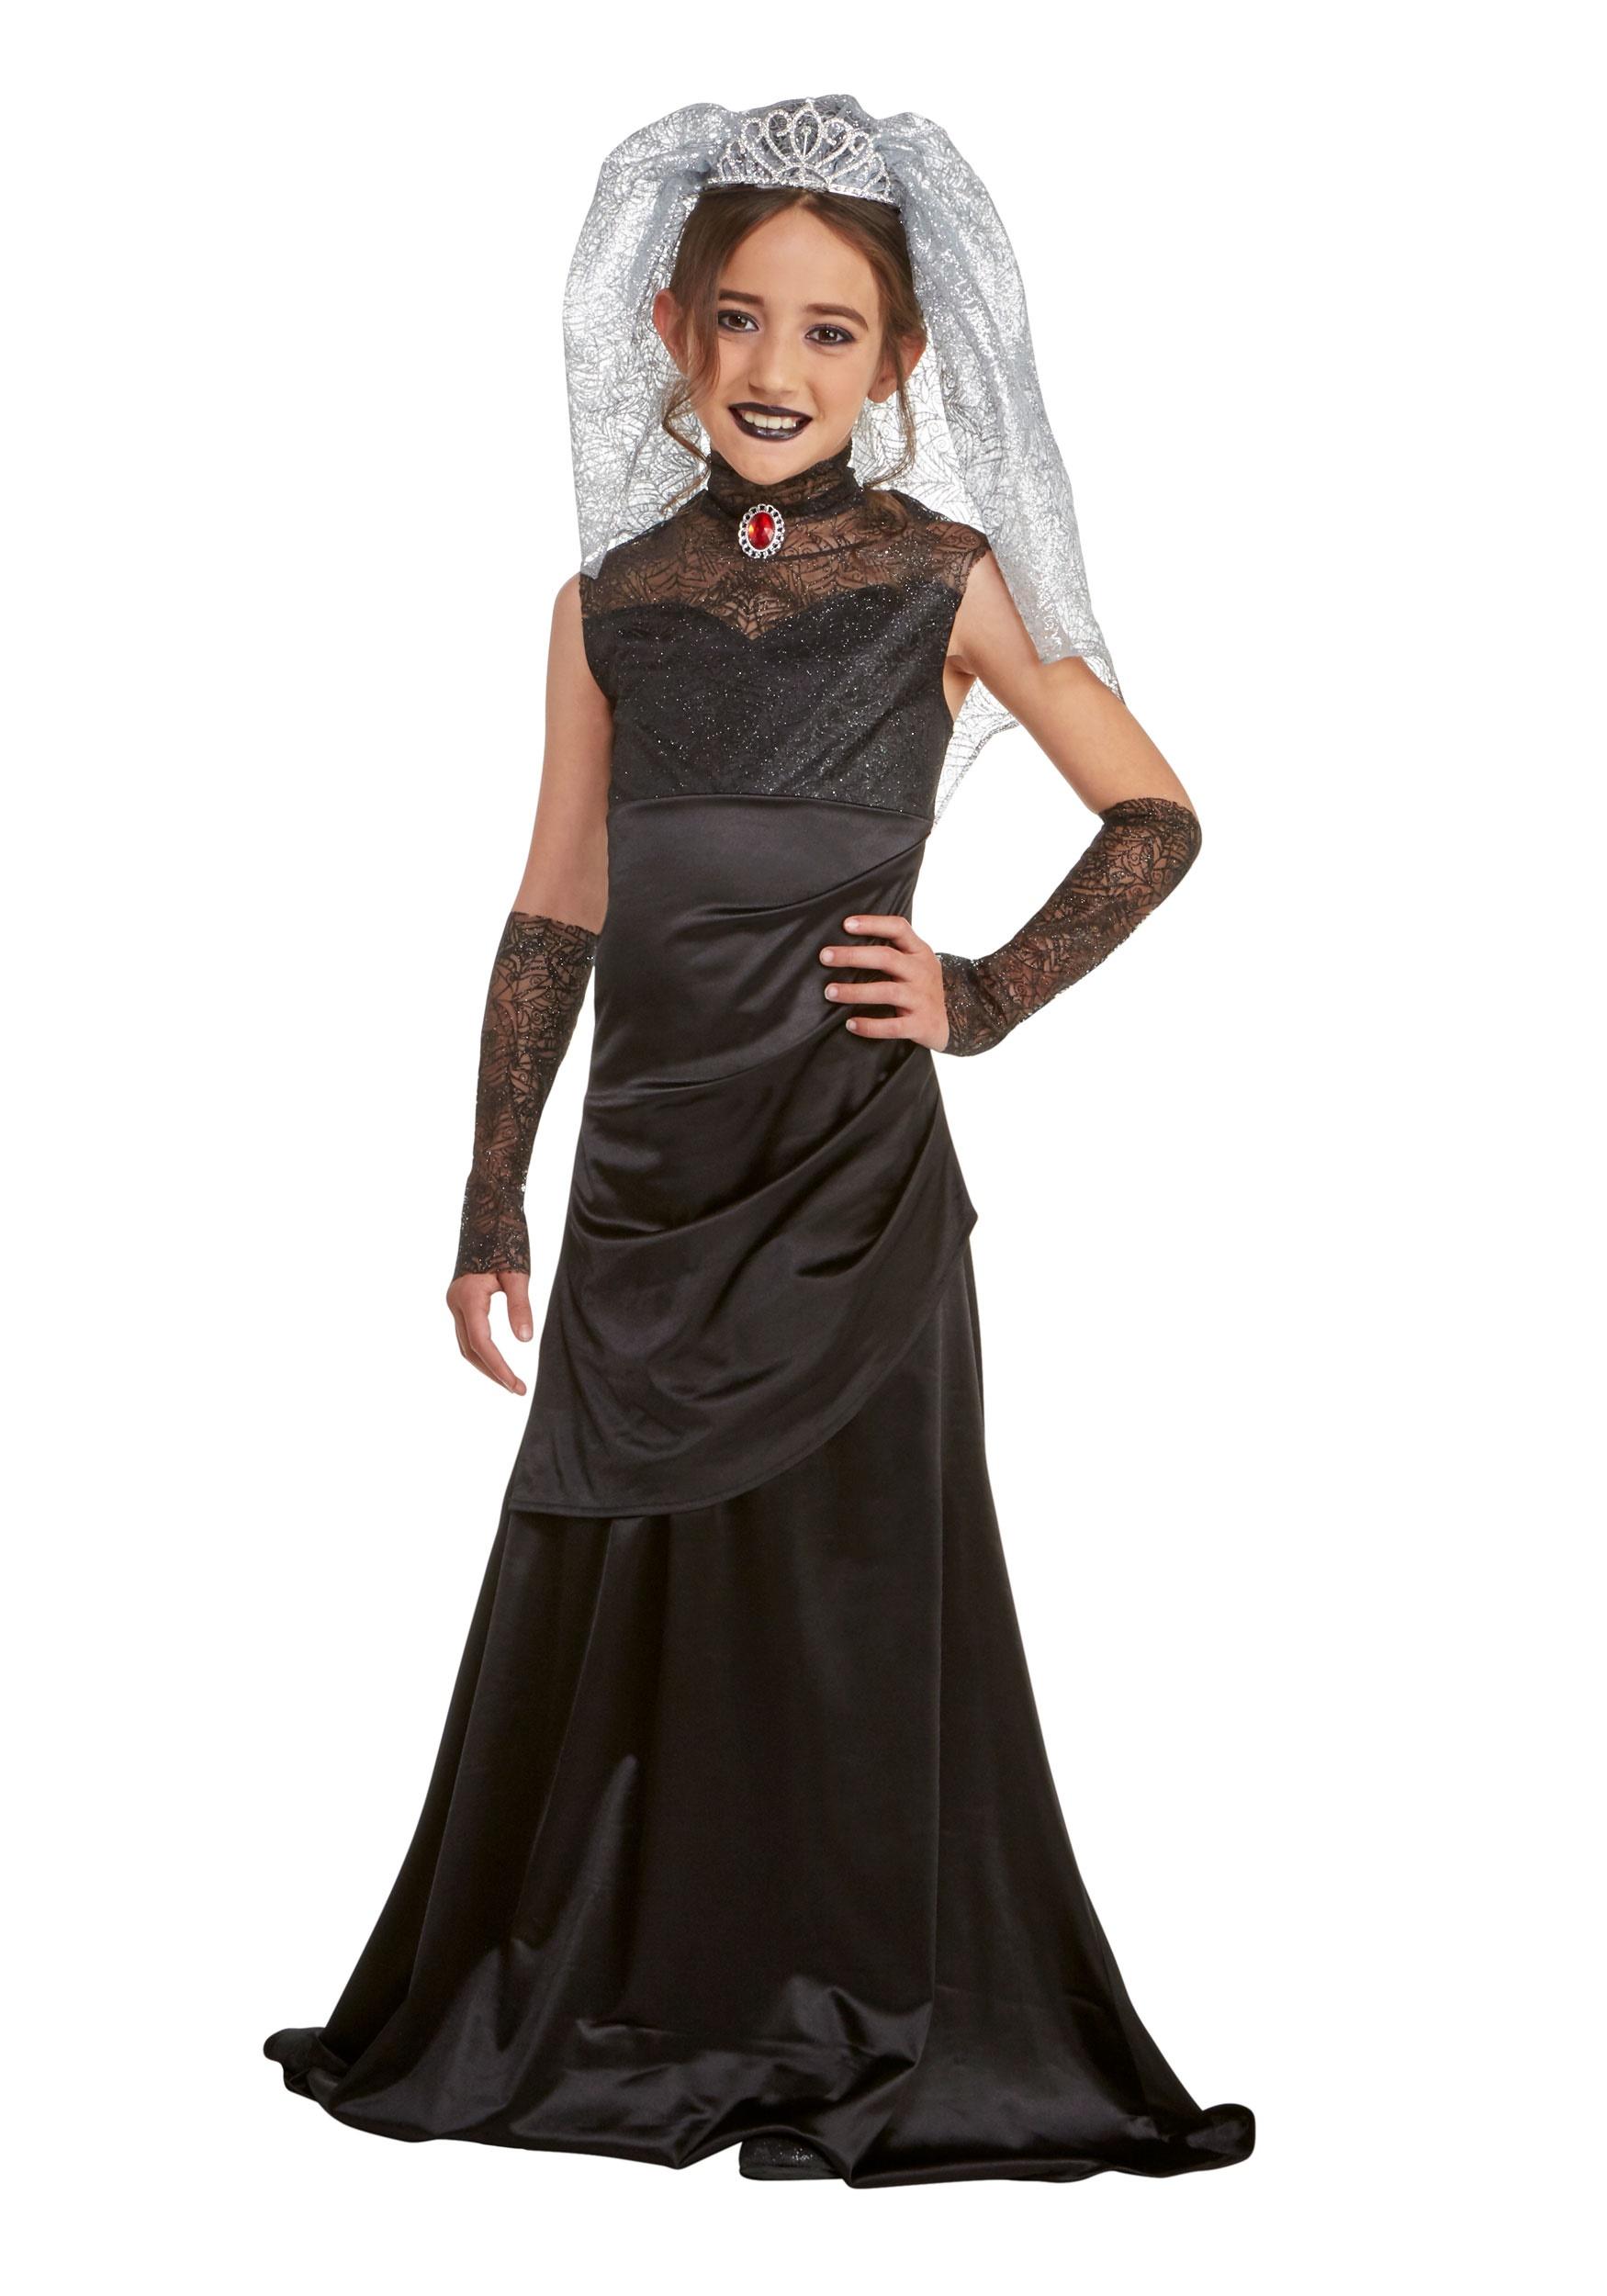 Girls Deluxe Mavis Costume